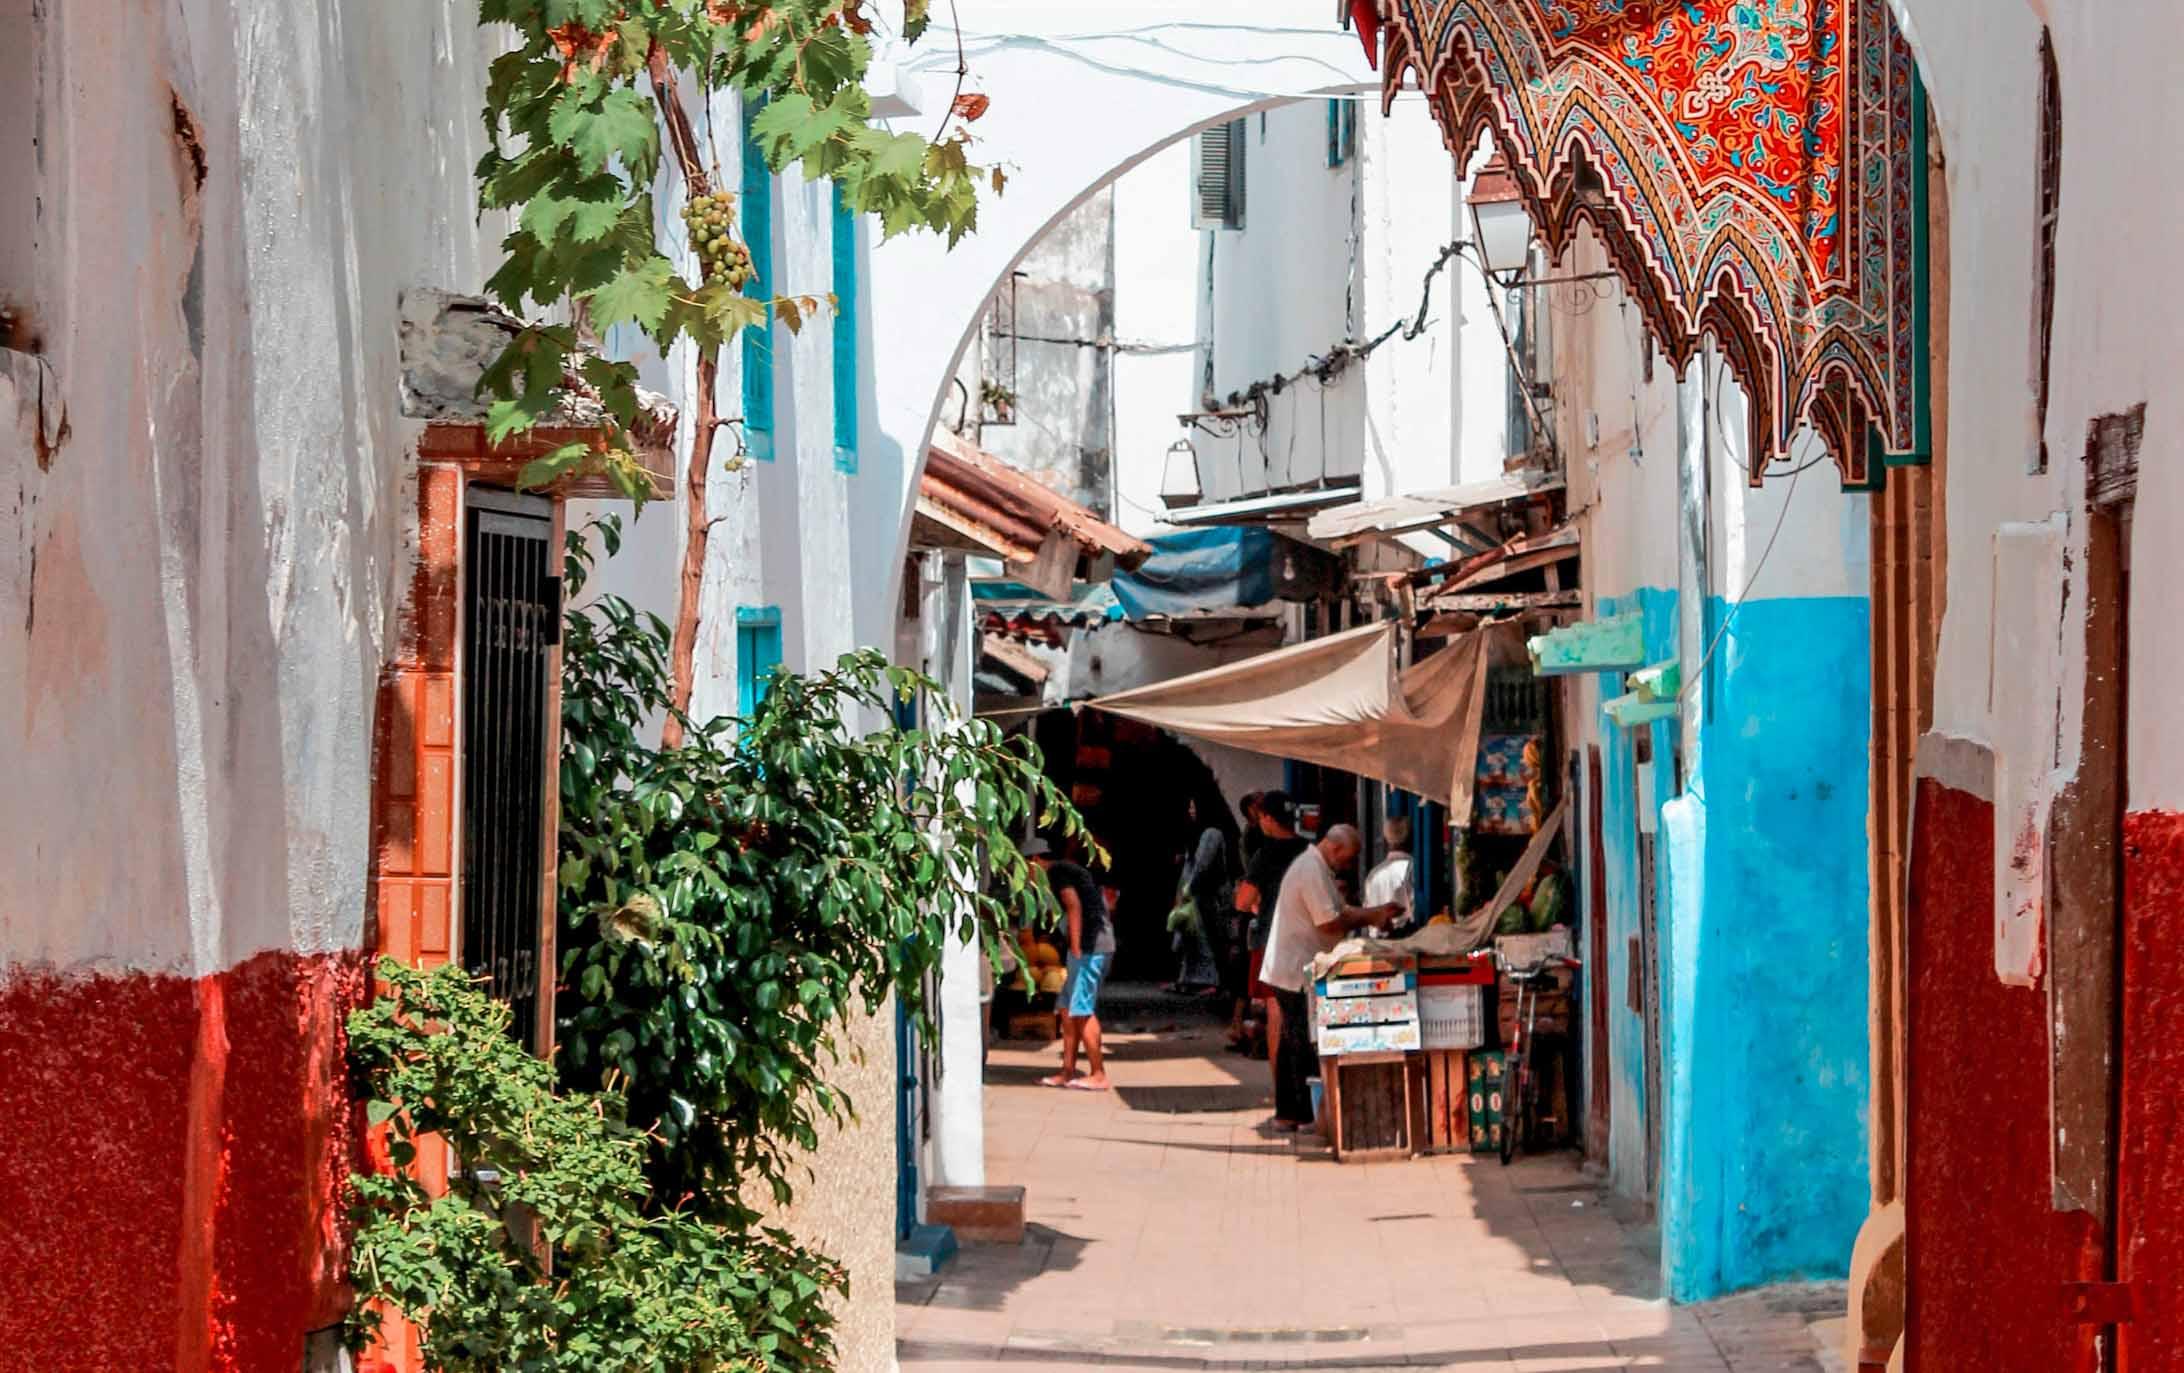 Rabat Maroc - Kasbah des Oudayas 2